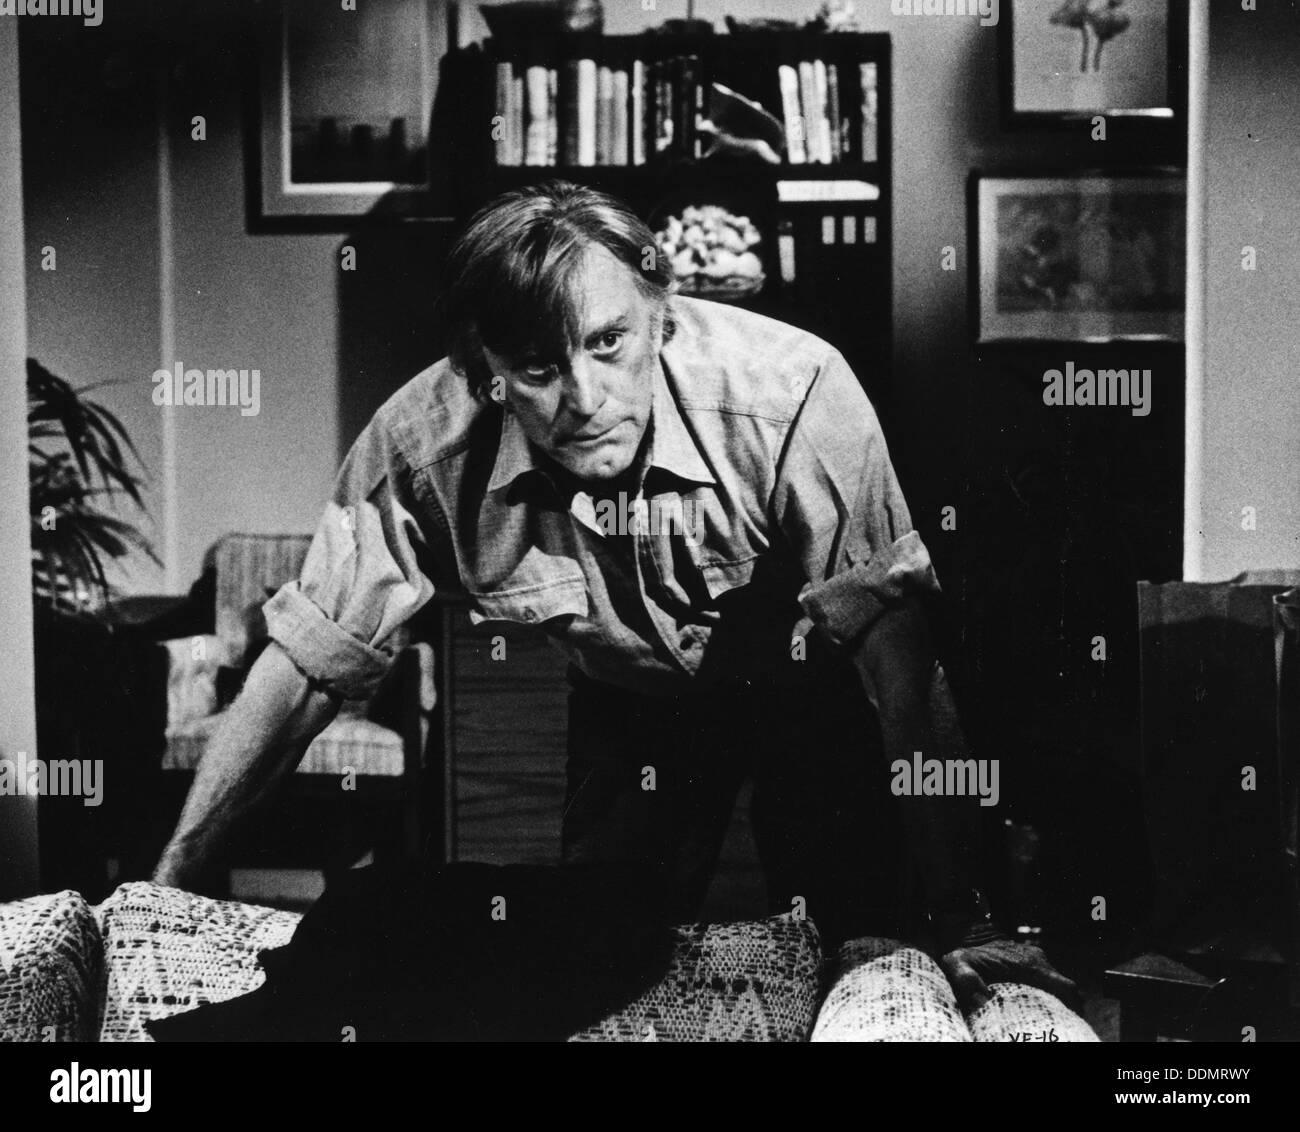 Kirk Douglas (1916- ), American actor, 1976. - Stock Image